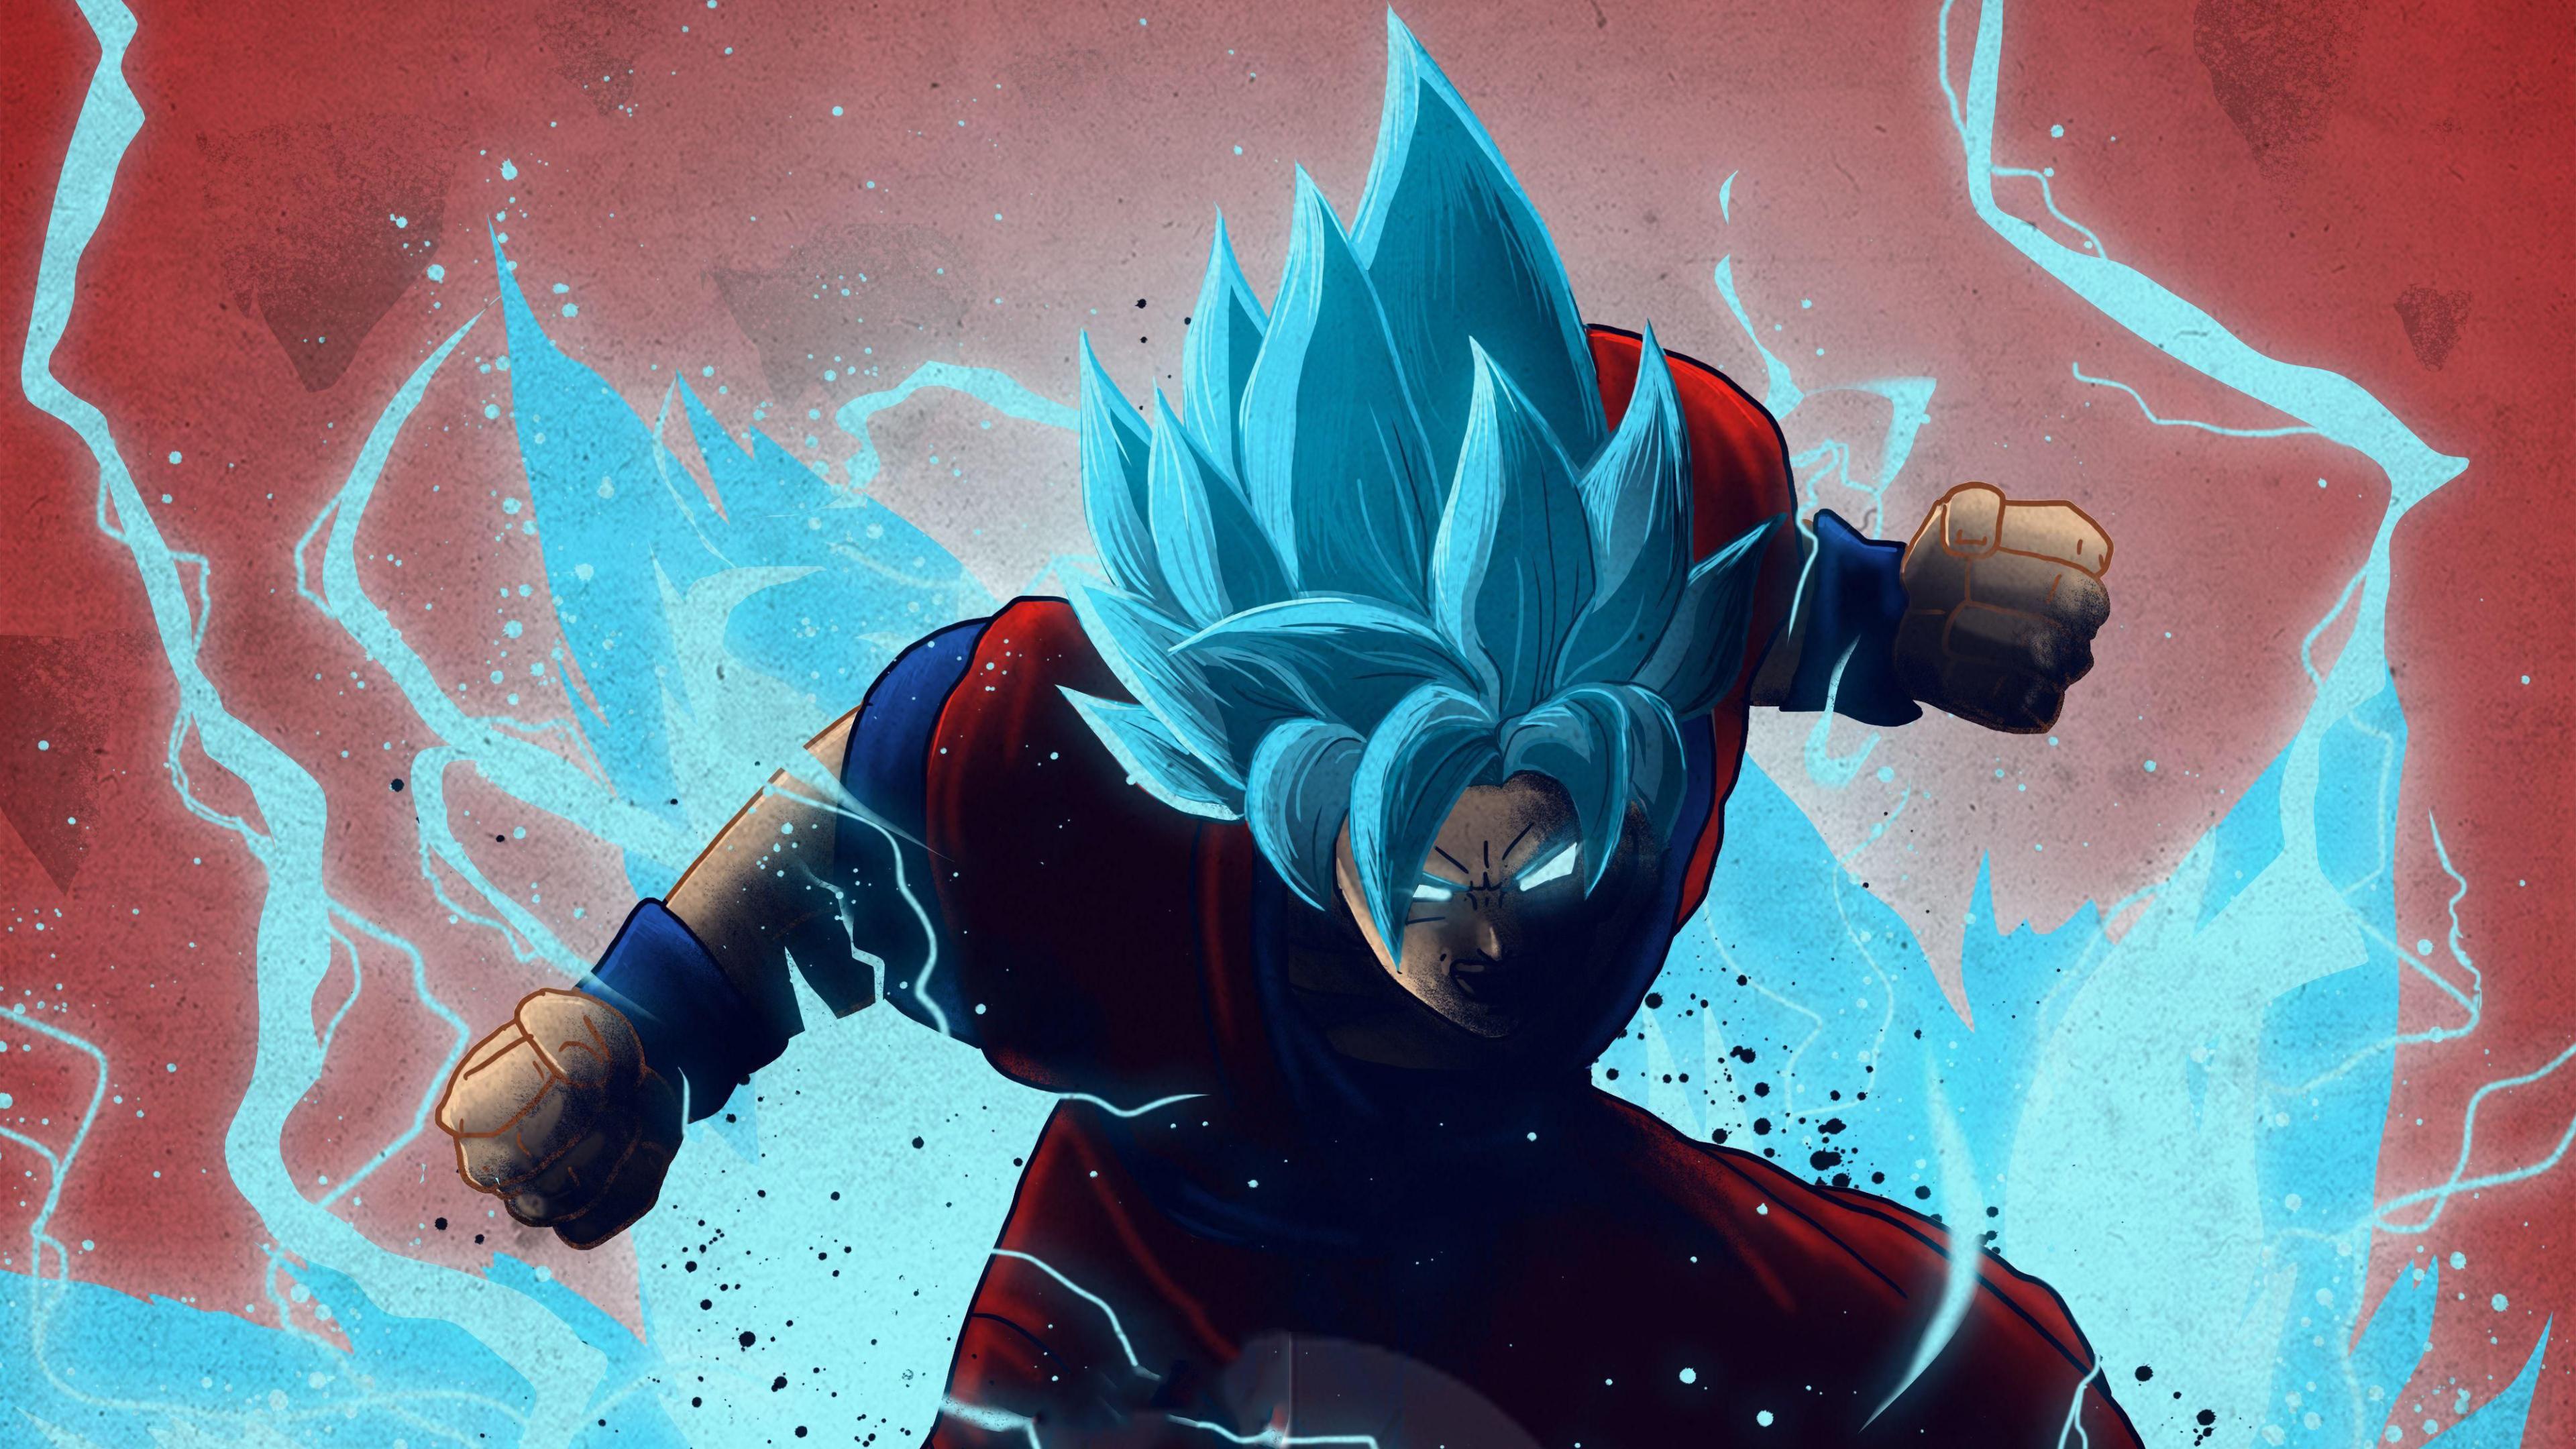 Goku Dragon Ball 4K Art Wallpaper, HD Anime 4K Wallpapers ...